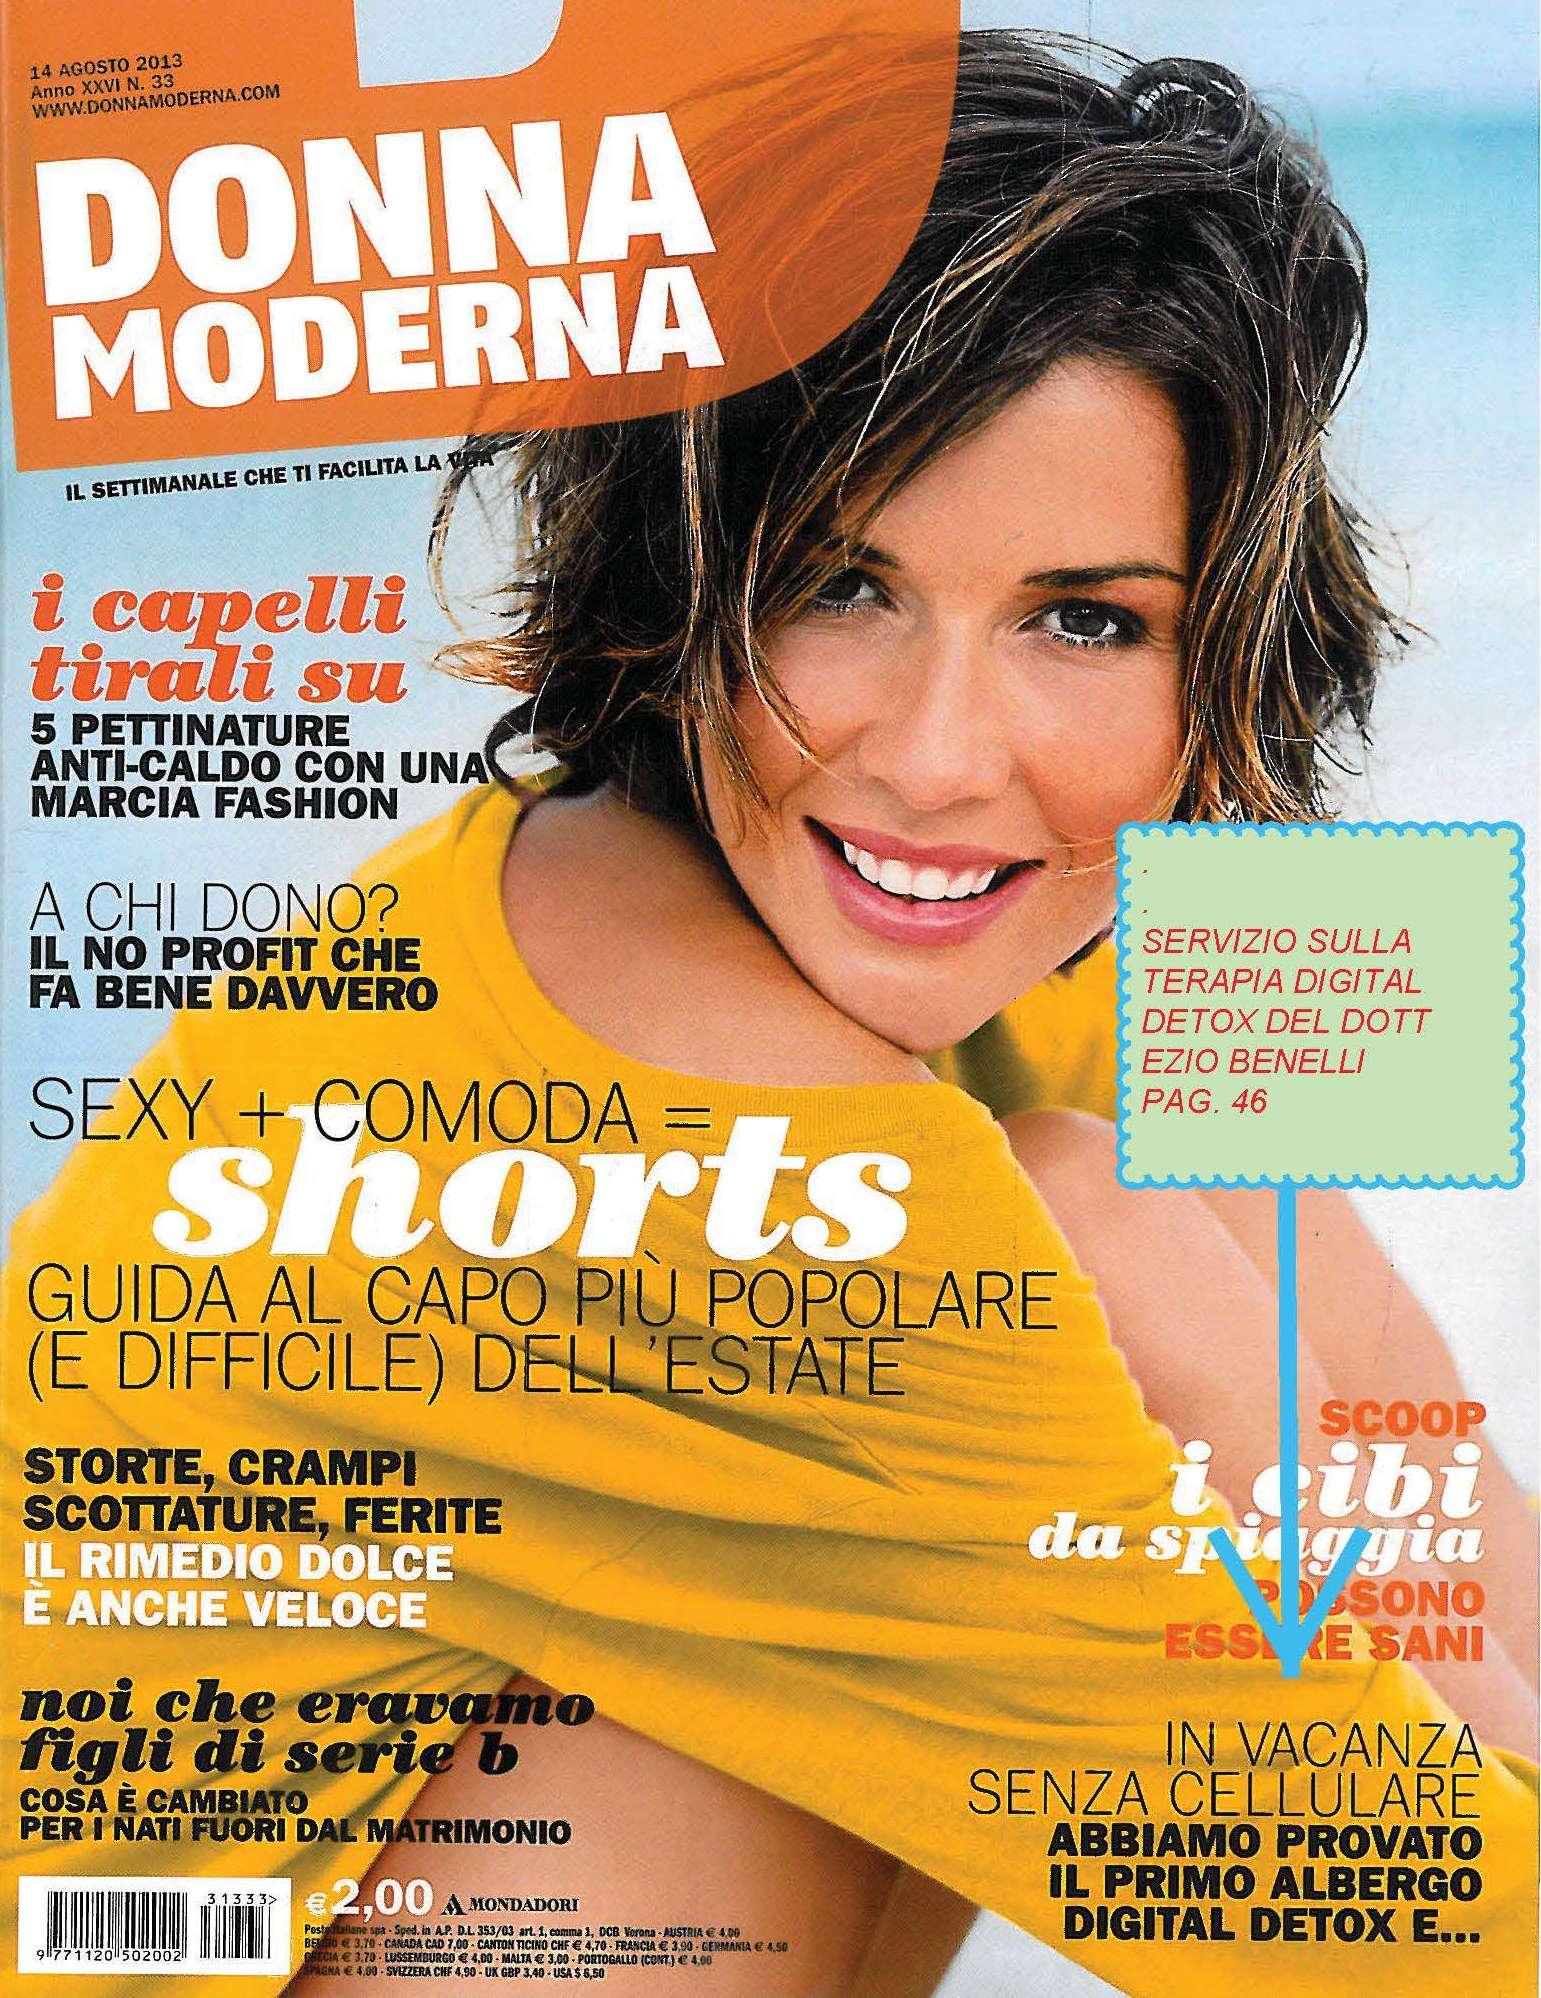 ... COPERTINA DONNA MODERNA 9 8 2013-comm - COPERTINA-DONNA-MODERNA-9-8-2013-comm